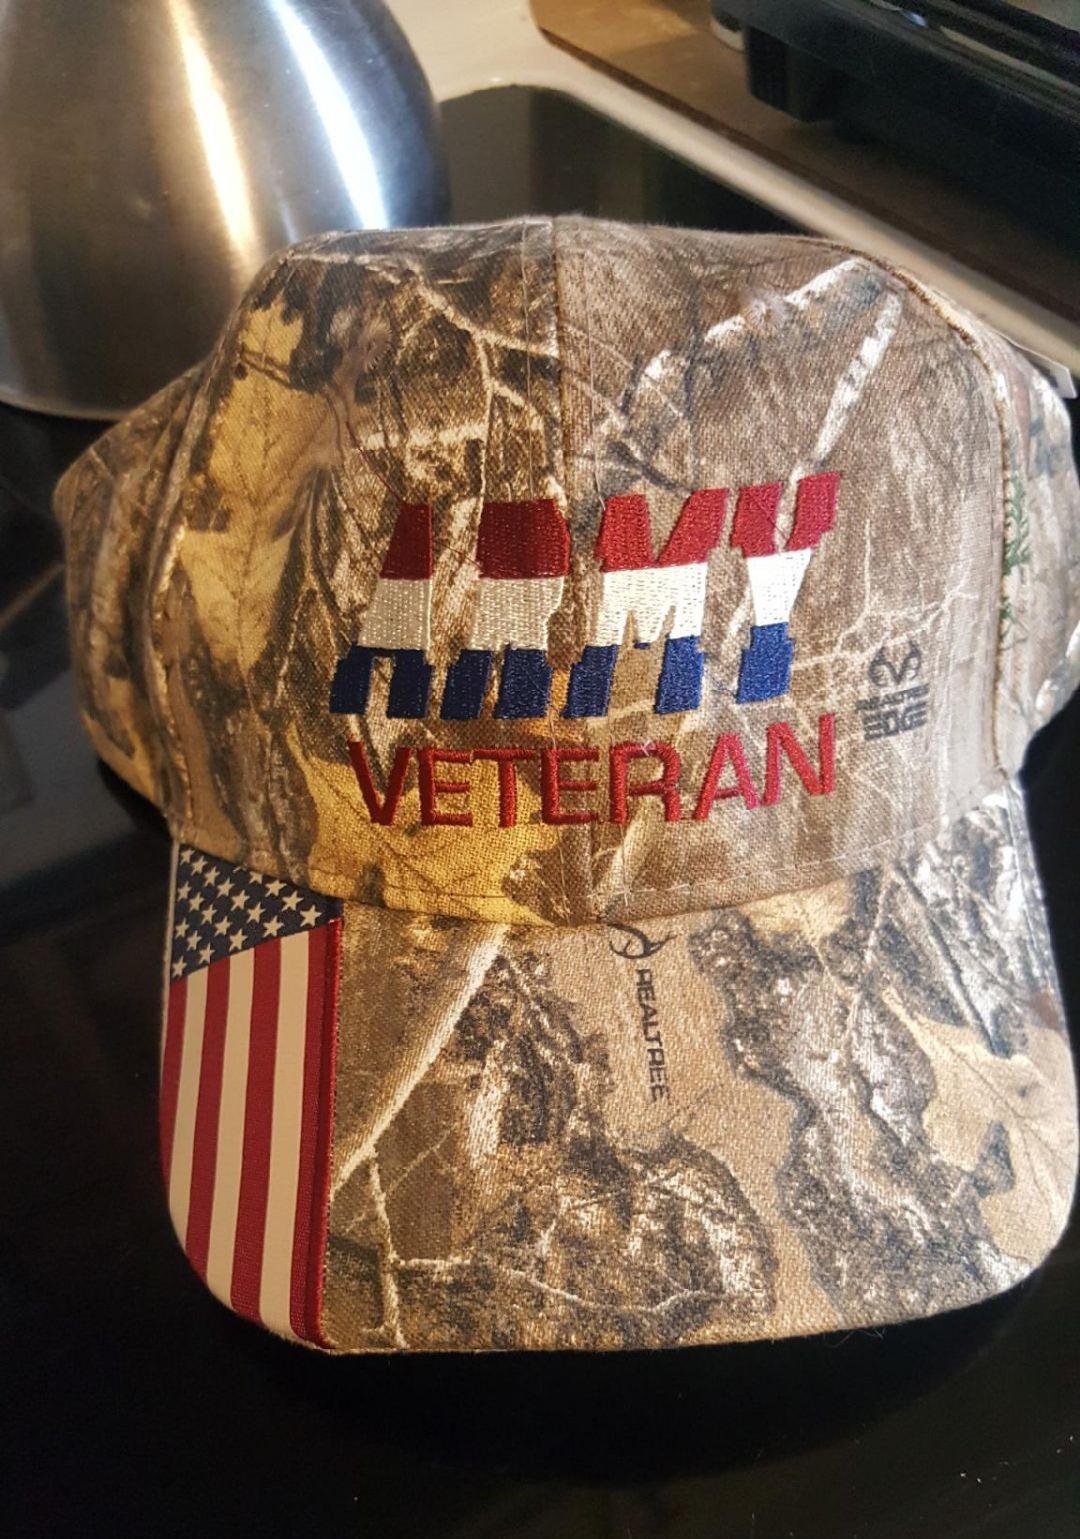 army-vet_edited